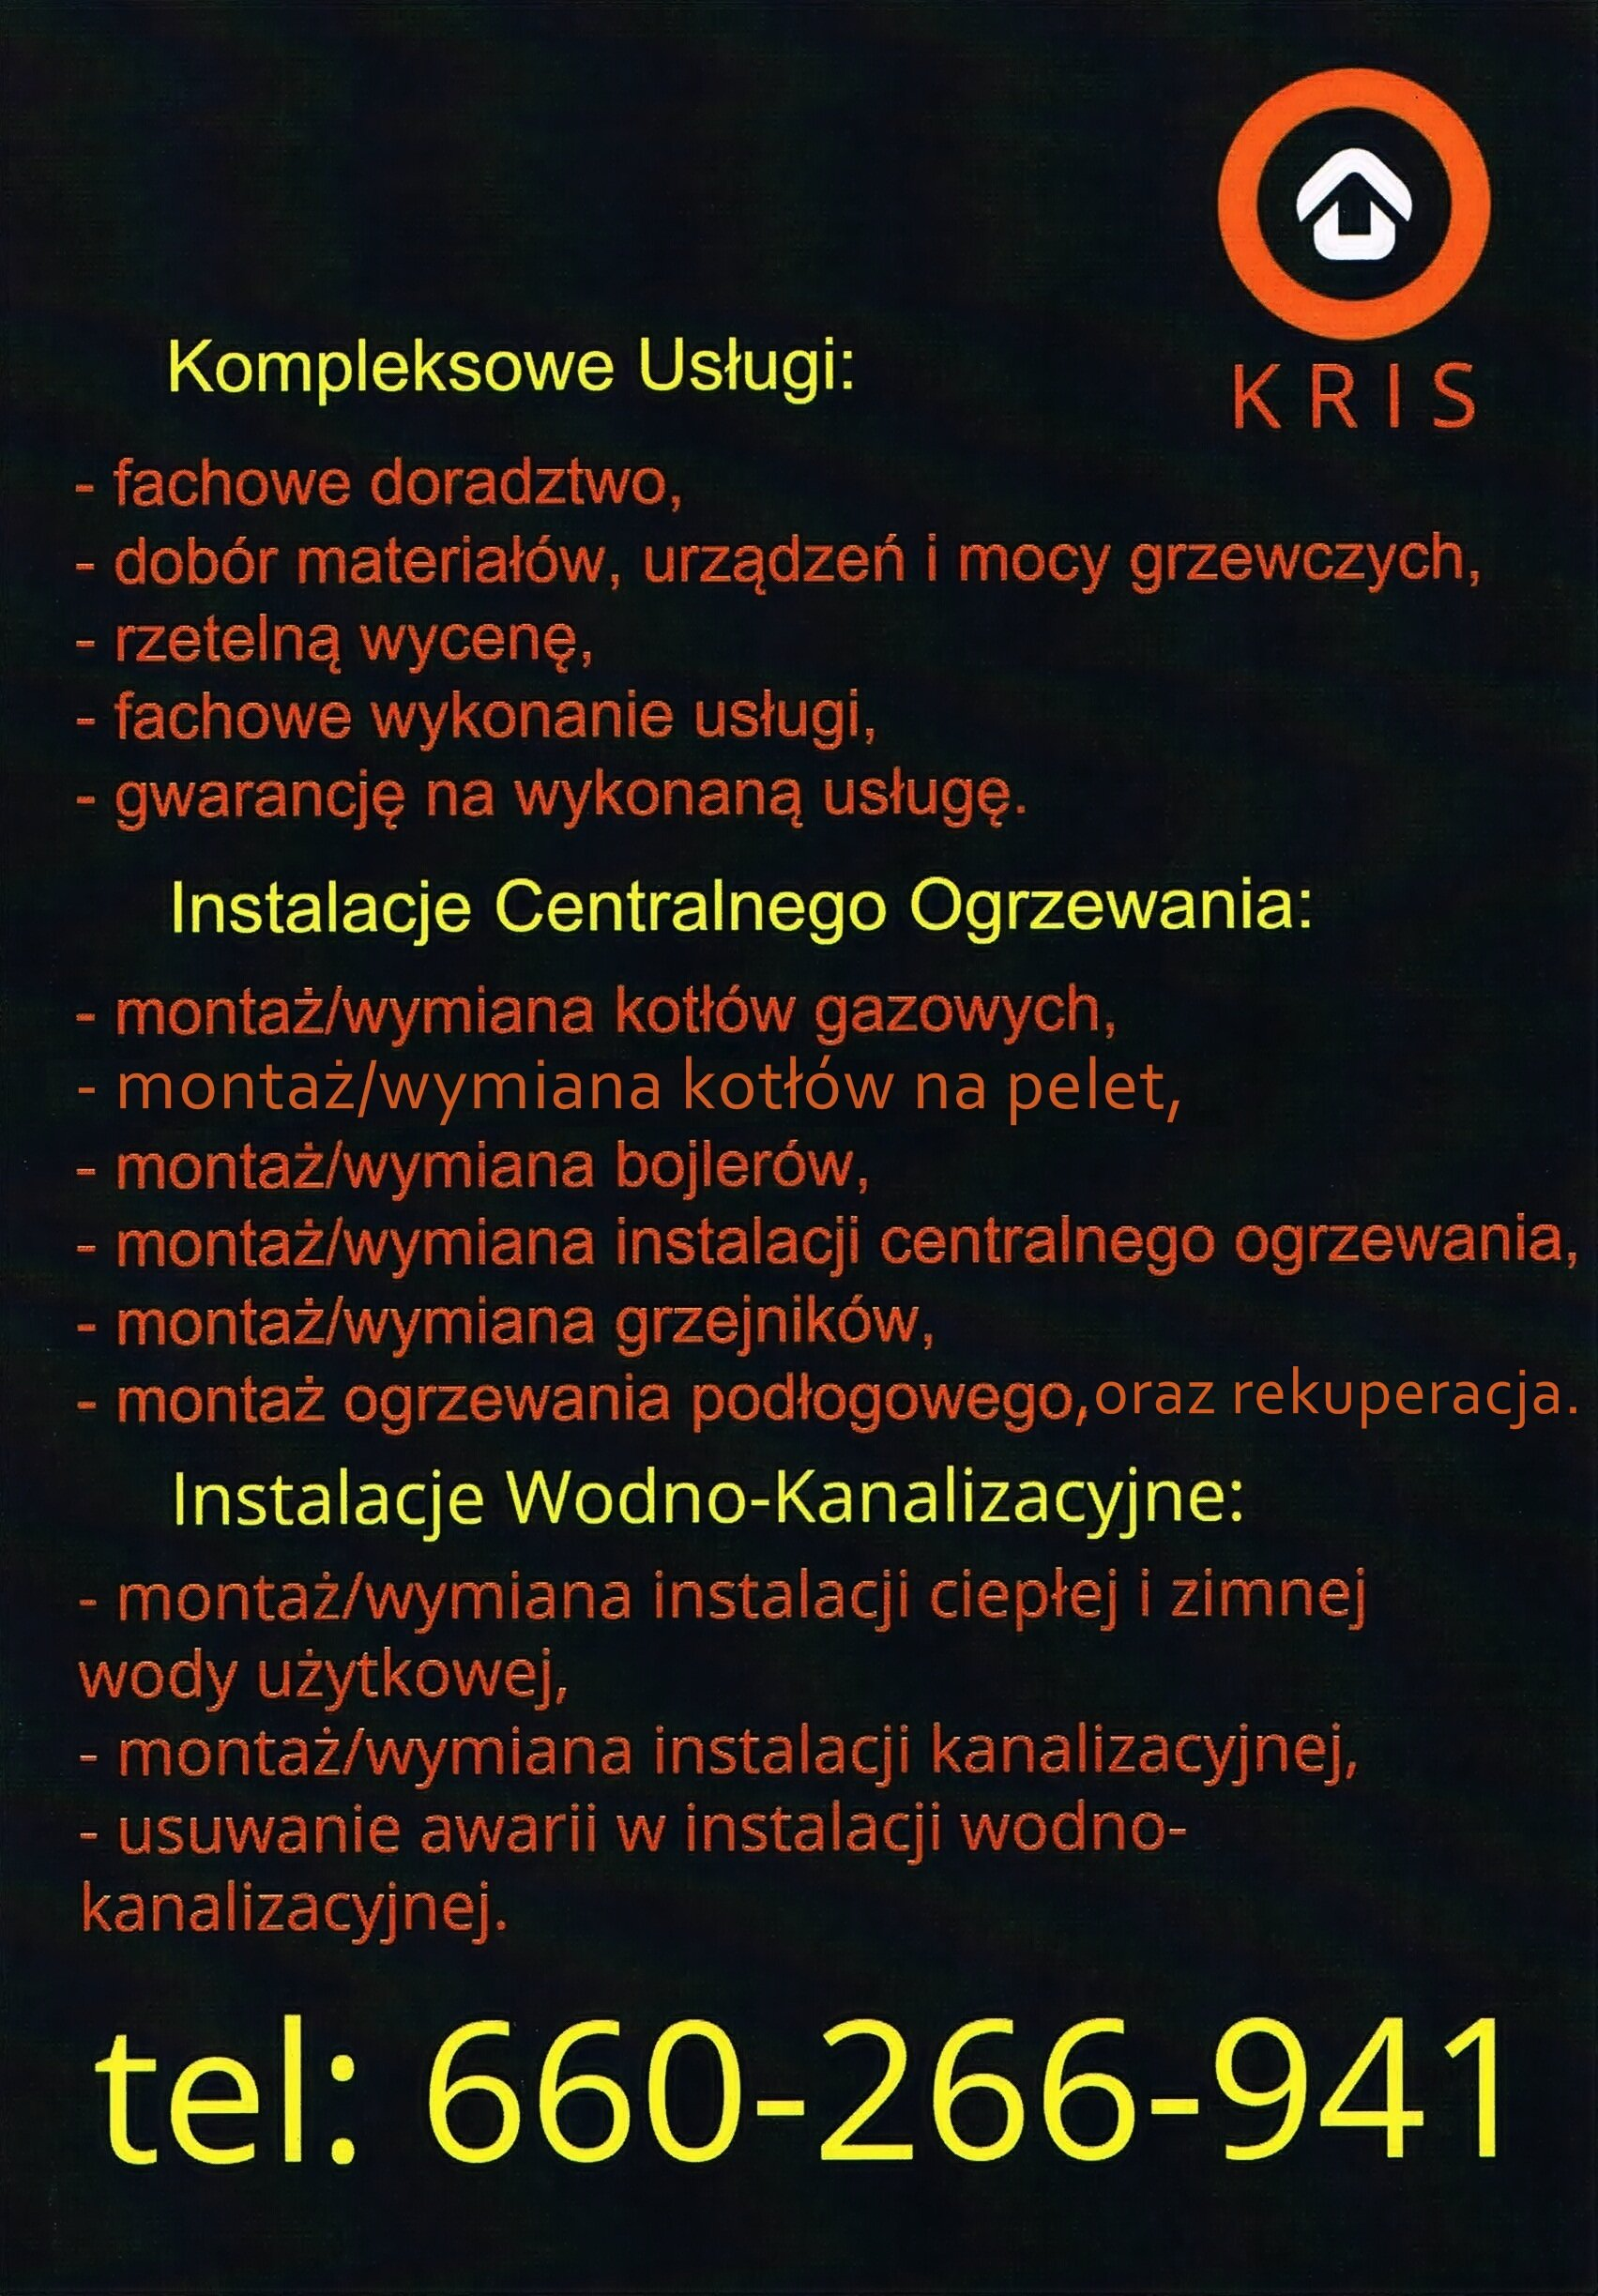 KRIS2